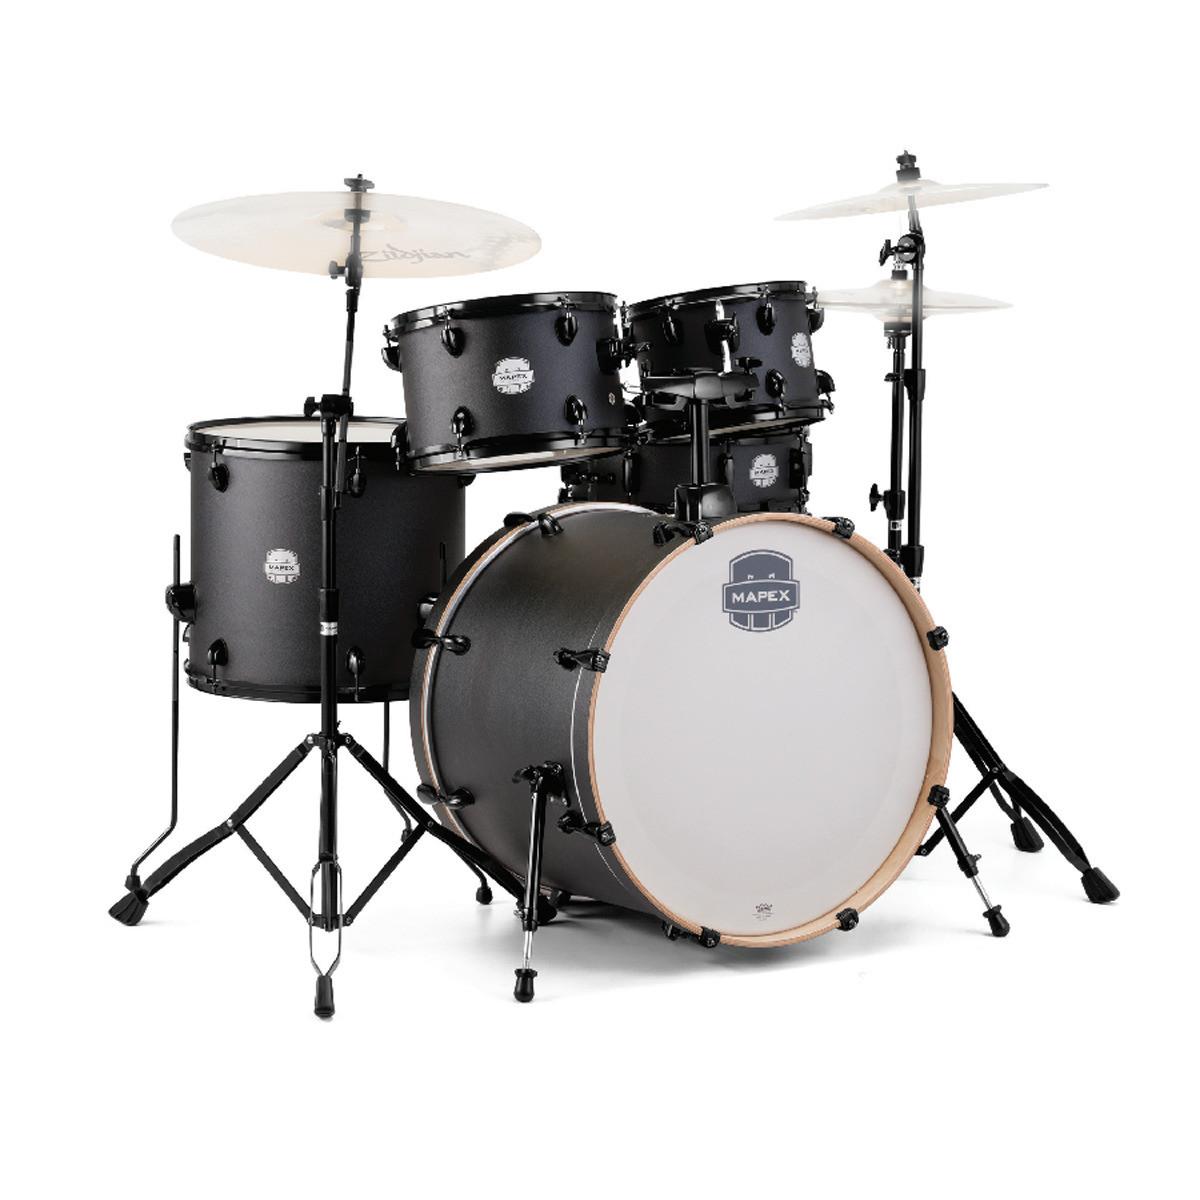 Mapex Storm 20 Fast Fusion Drum Kit W Hardware Textured Black At